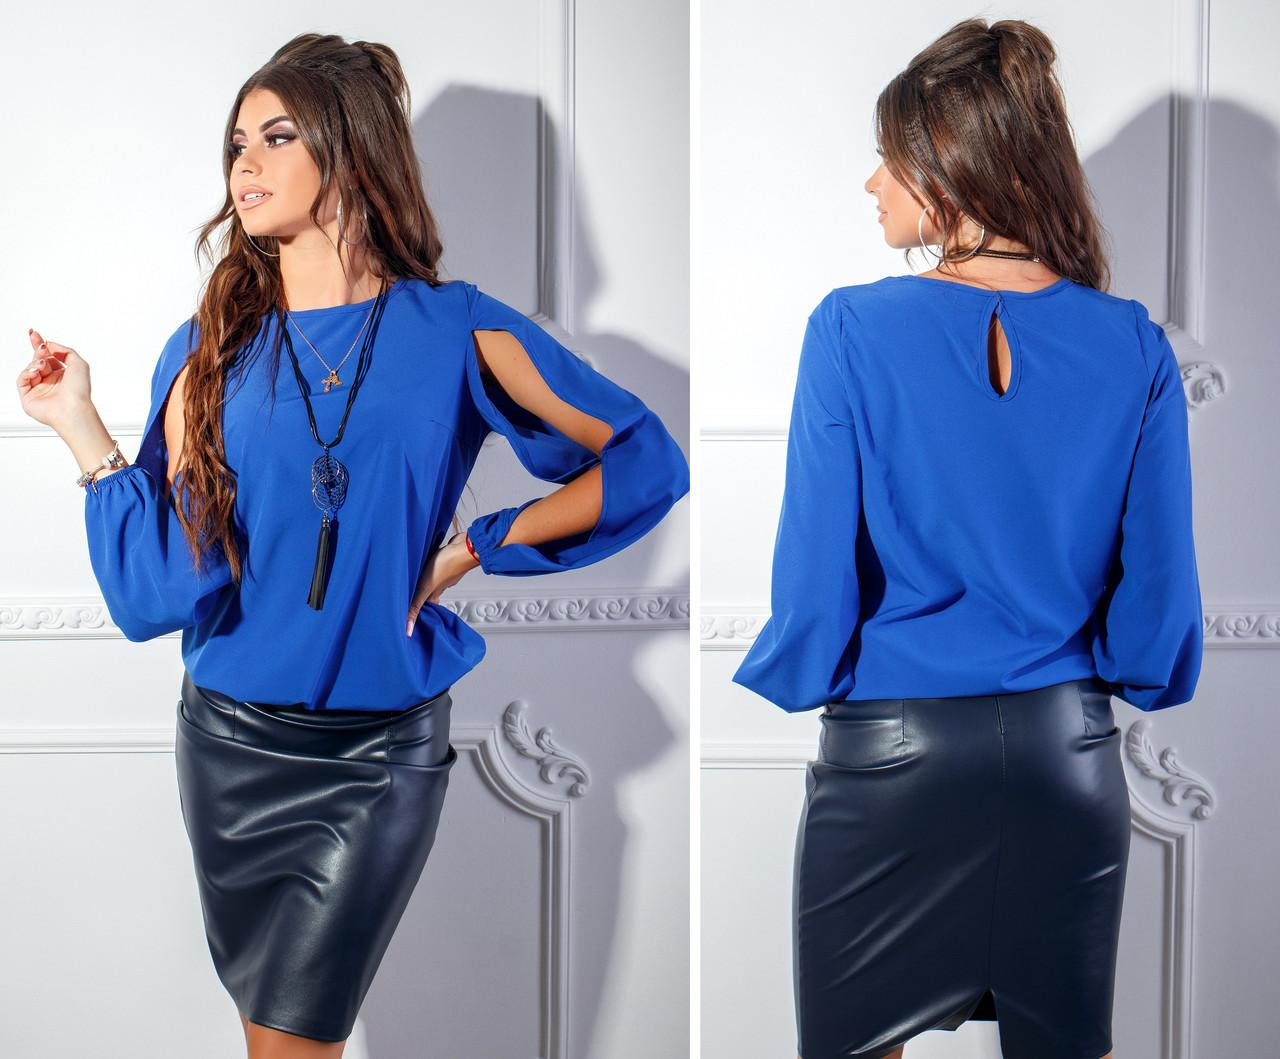 5133c80811a Ярко-синяя блузка из софта с украшением в комплекте и разрезами на рукавах  - Стильная